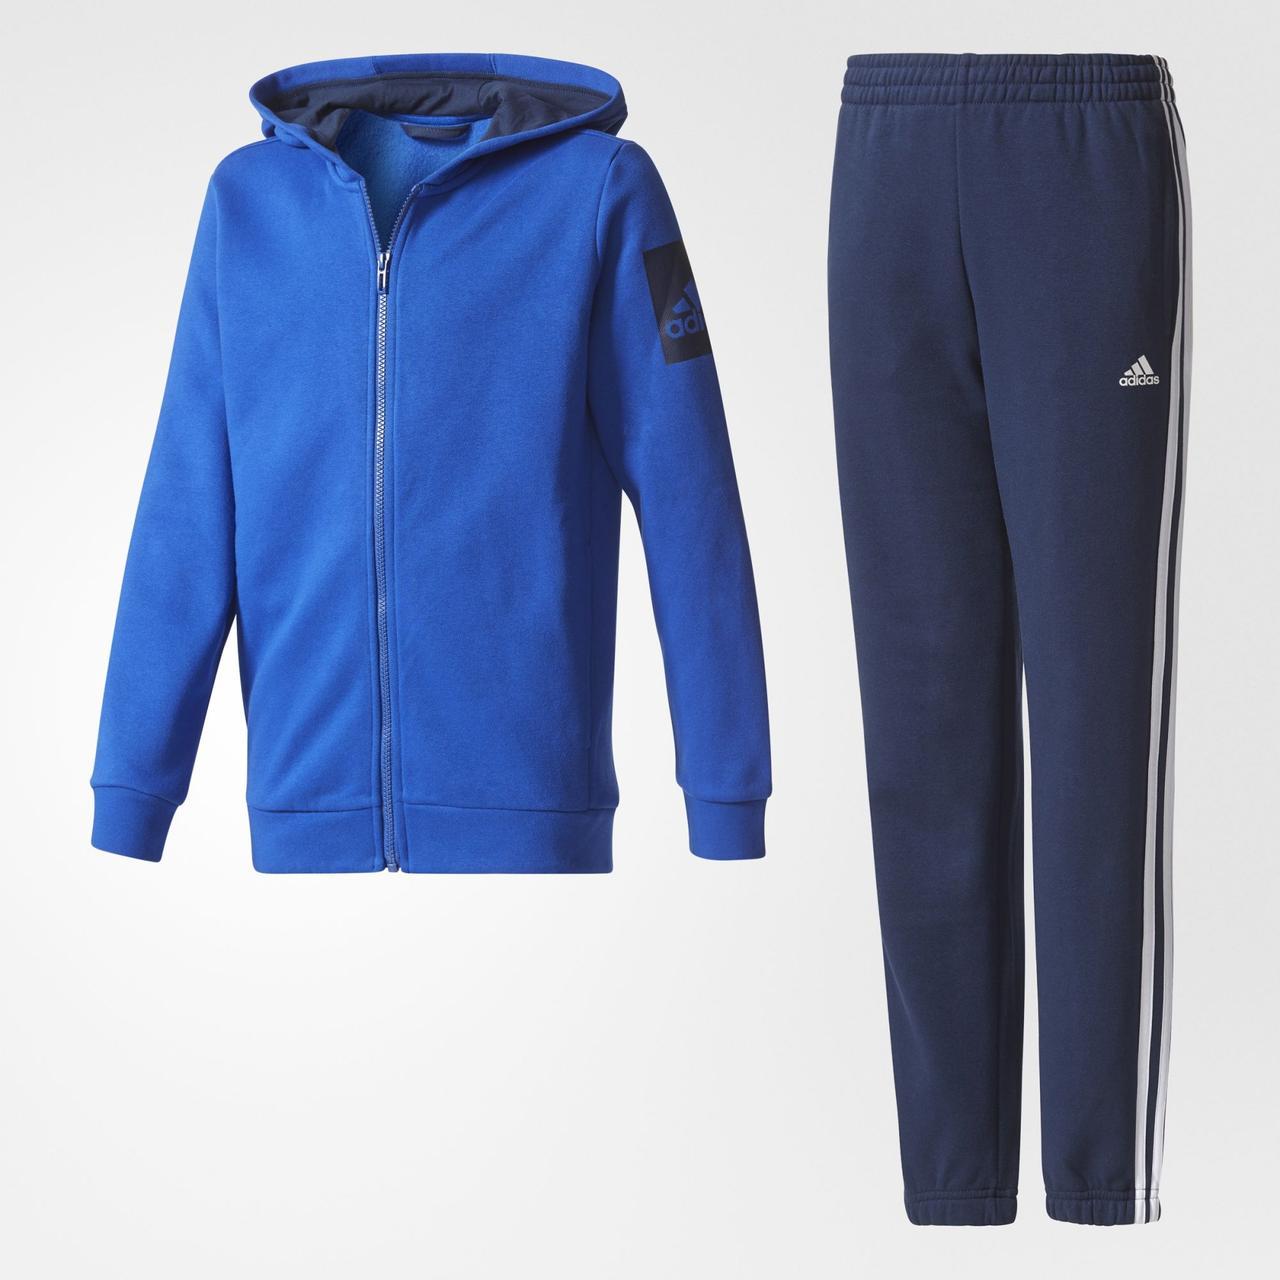 Купить Детский костюм Adidas Performance Hojo (Артикул  CE9990) в ... 7827a51561f